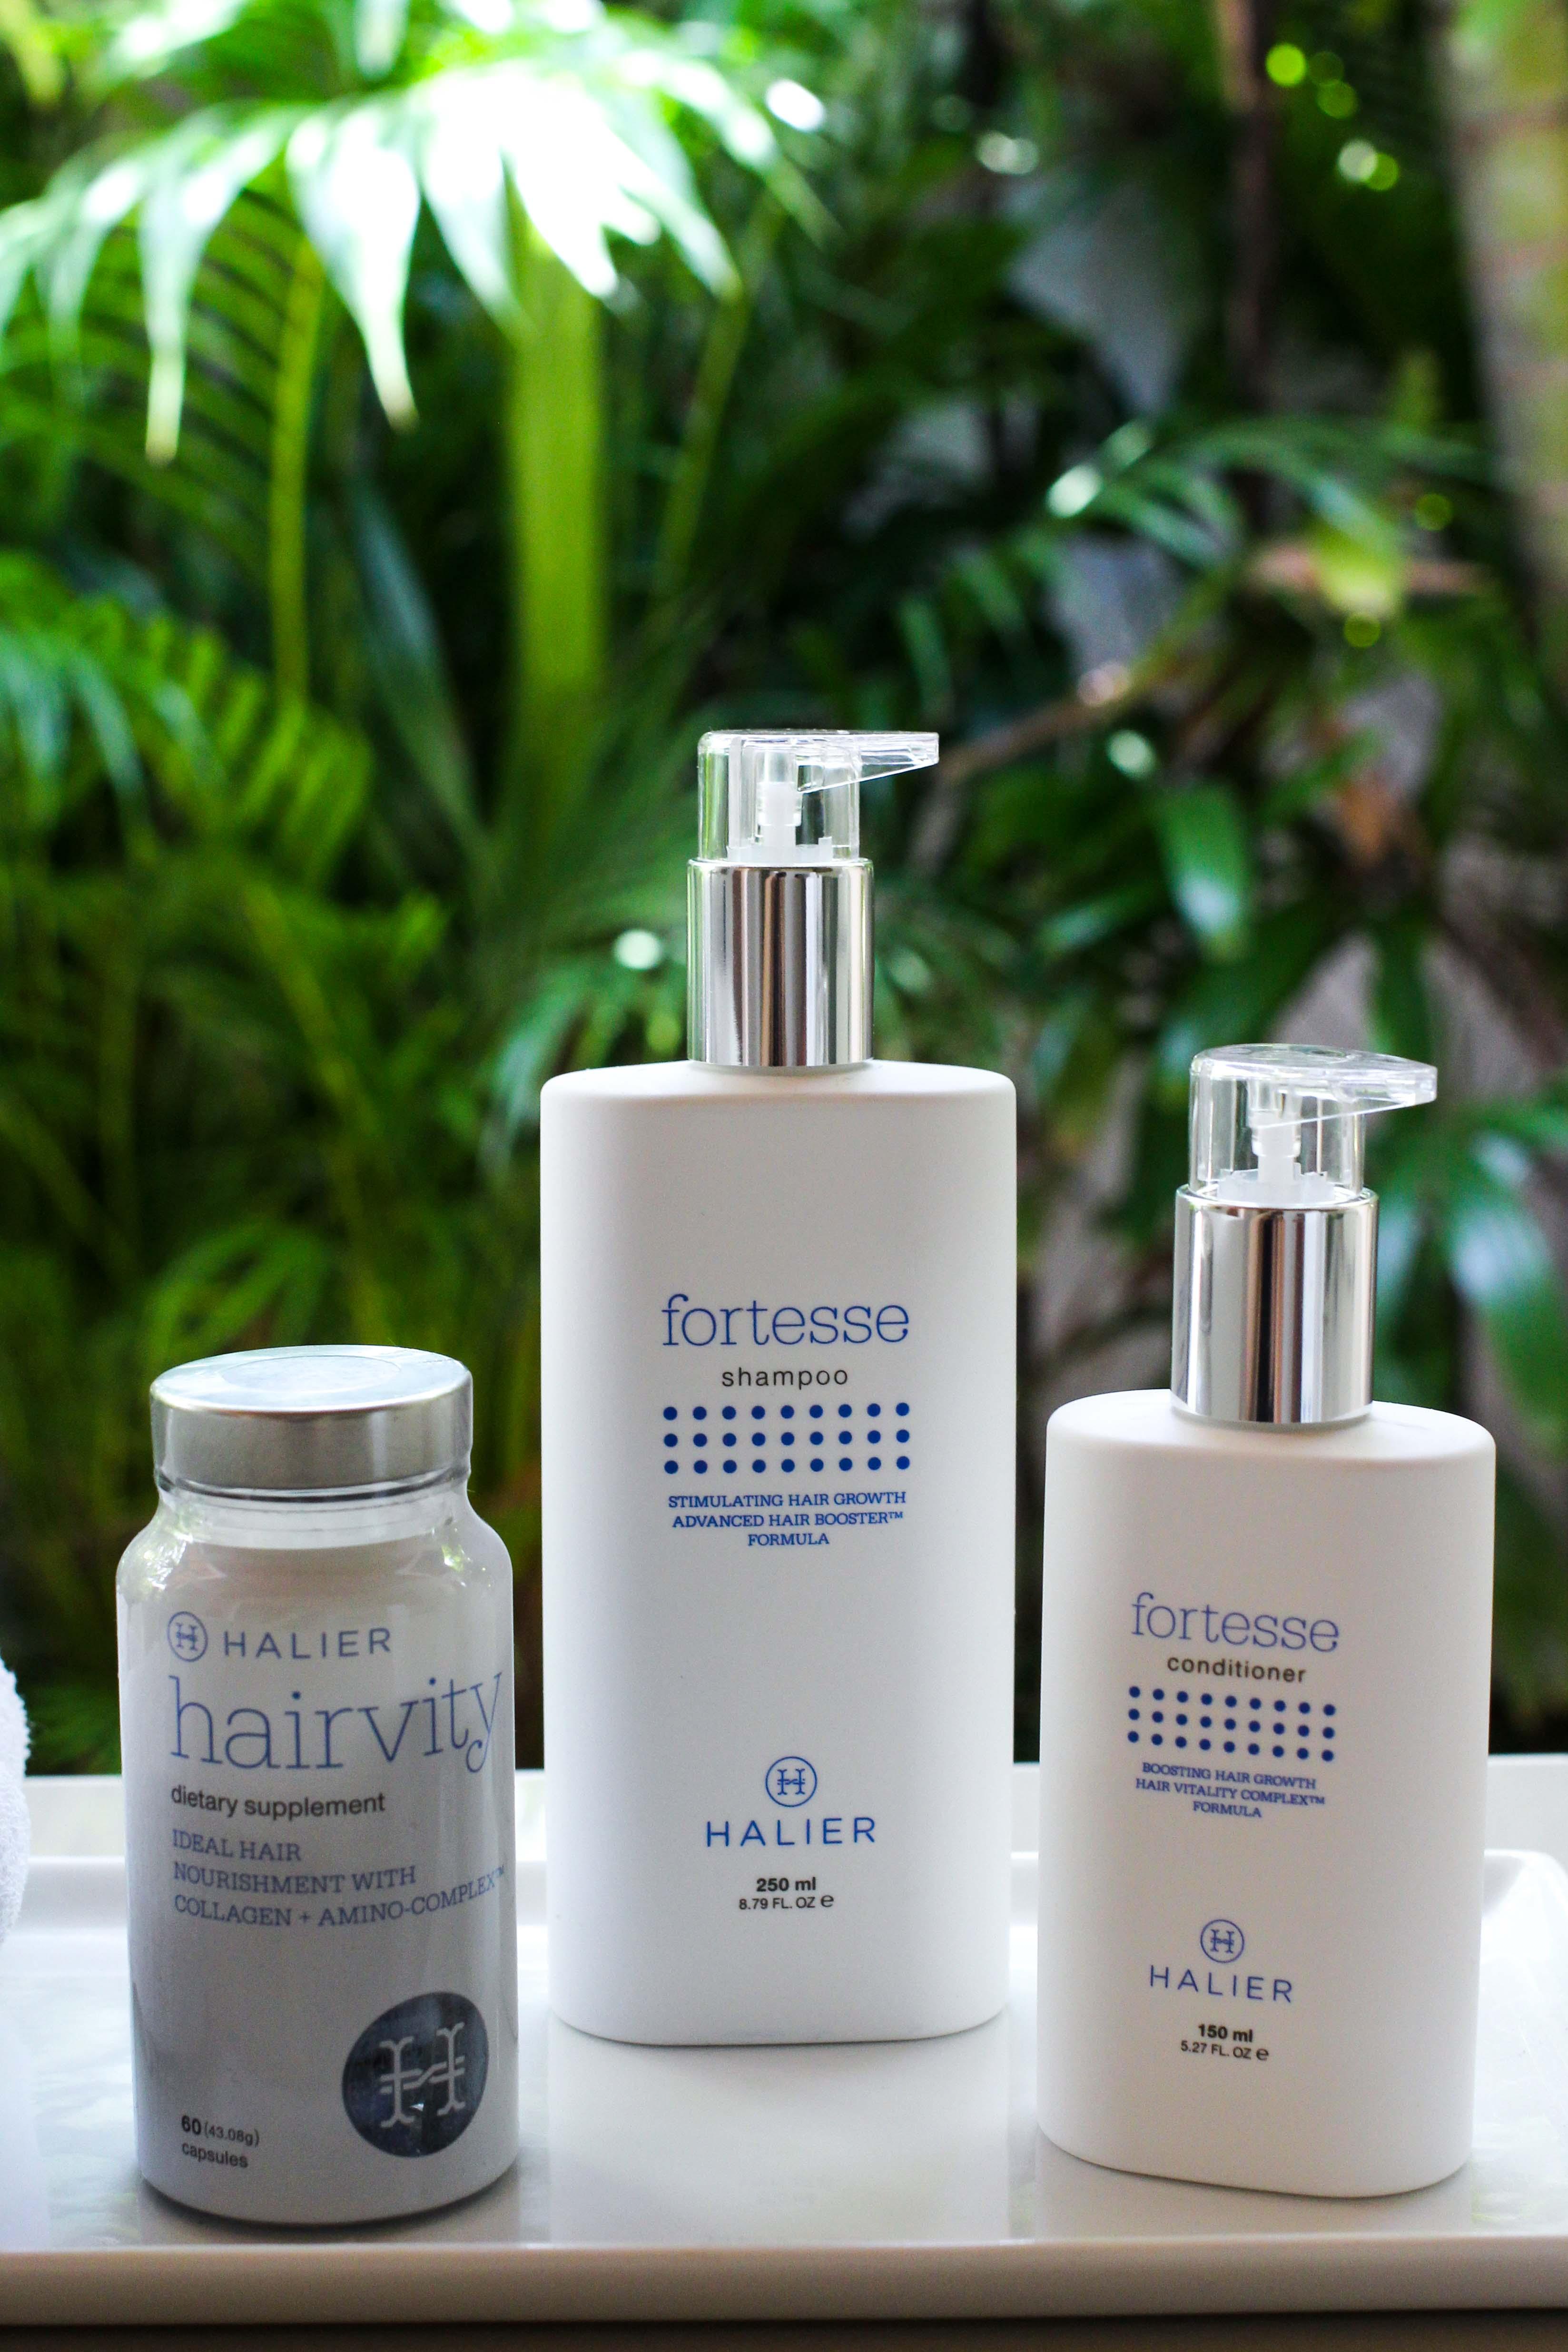 Haarpflege Halier Fortesse Shampoo Conditioner Test gesundes kräftiges Haar Beauty Blog